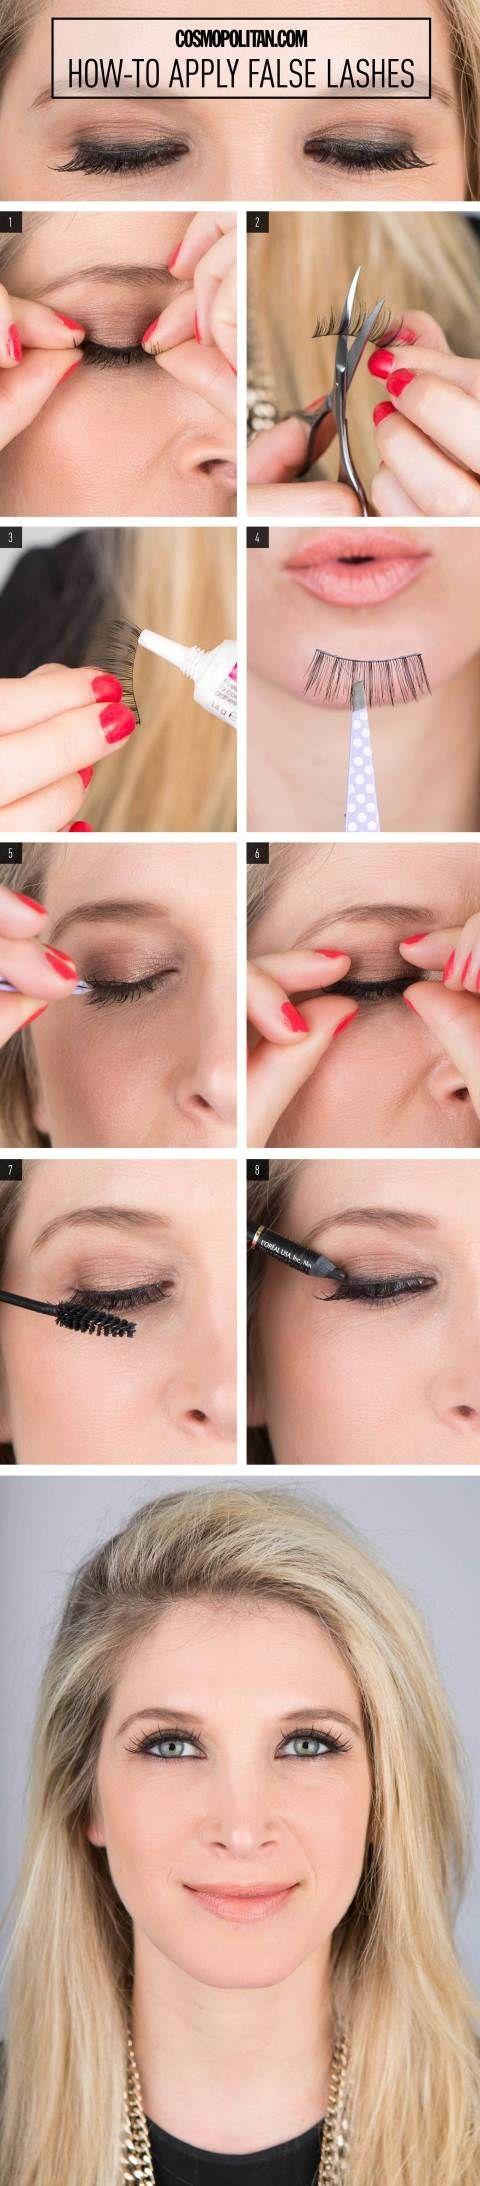 Makeup how to applying false lashes like a pro